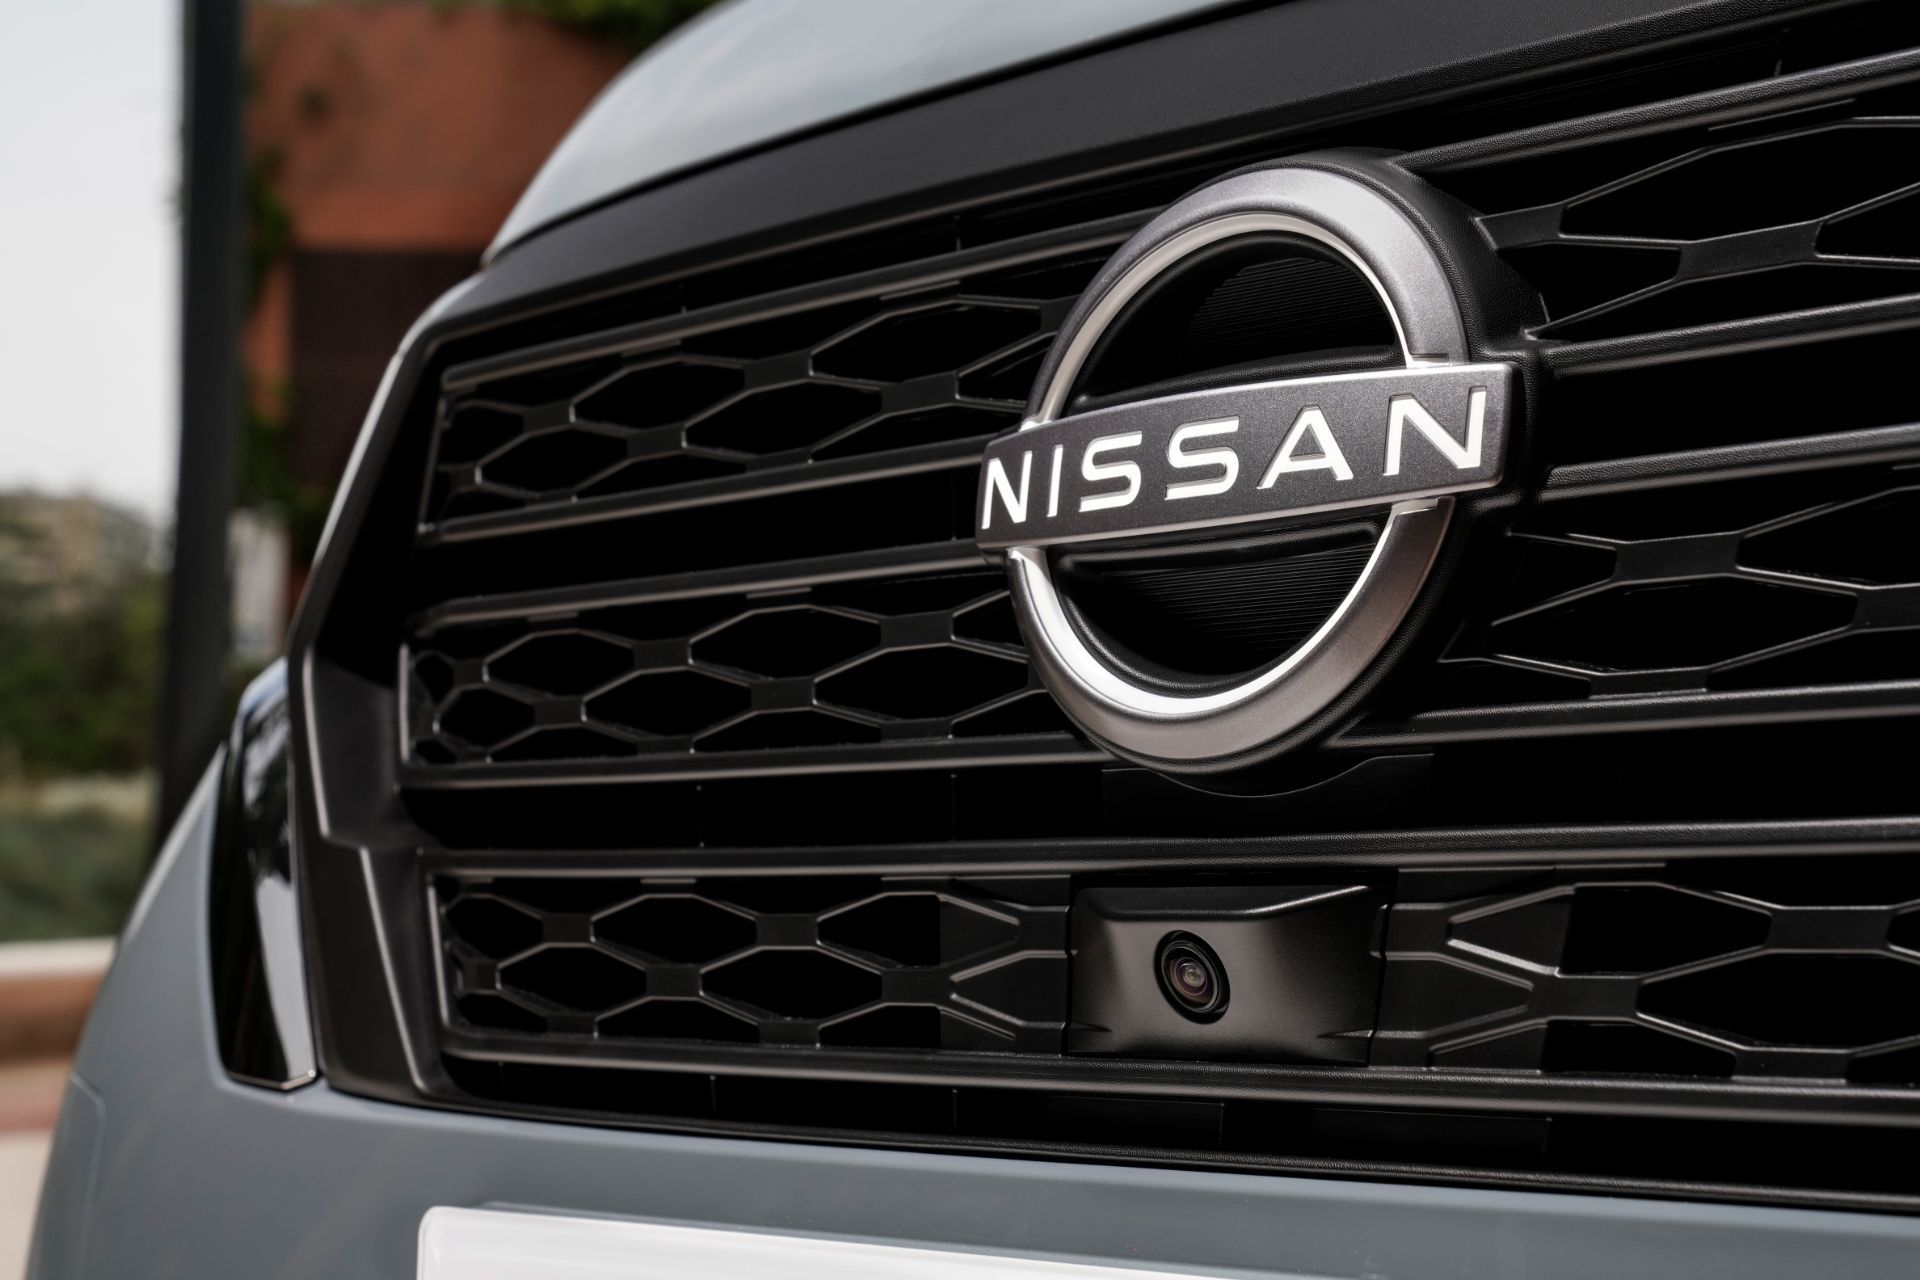 2022-Nissan-Townstar-petrol-van-dynamic-26